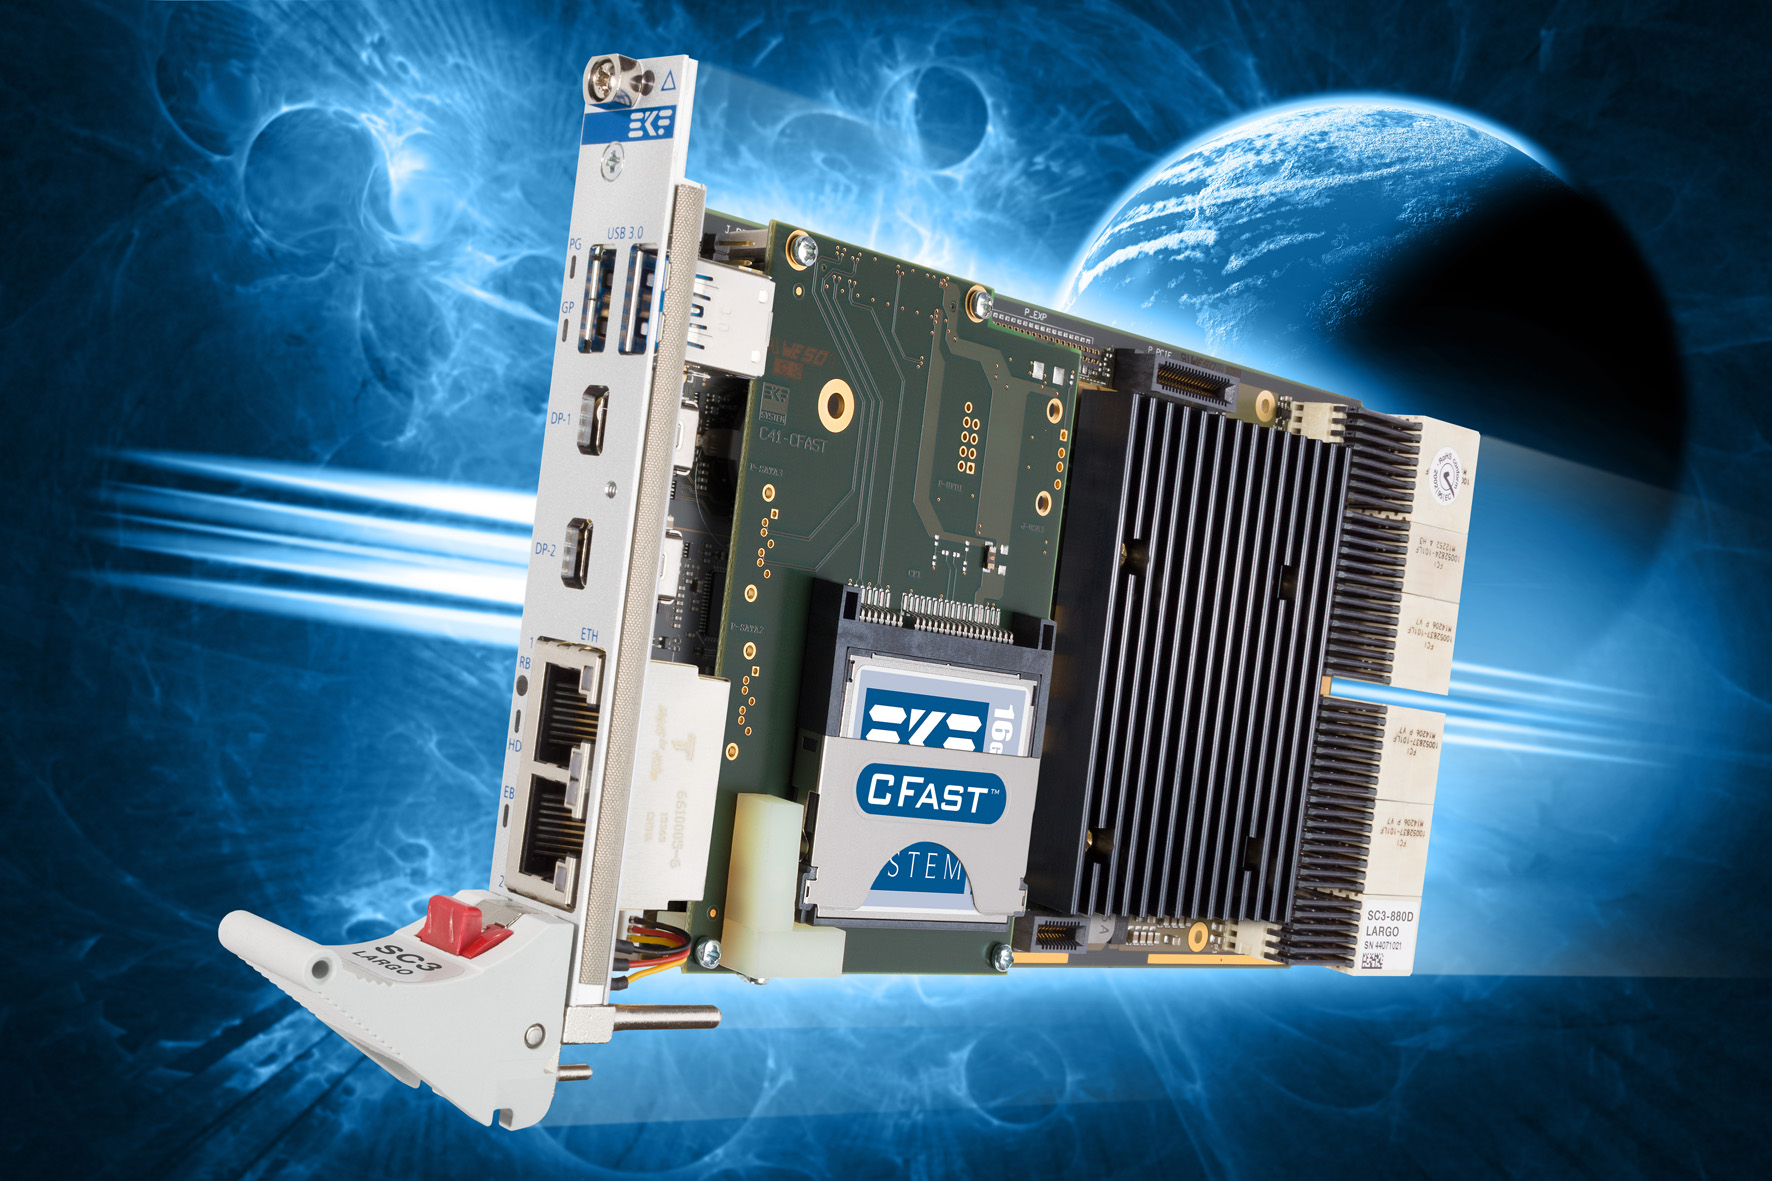 Ekf Compactpci Serial Cpu Boards Sc3 Largo 5th Generation Intel Sata To Usb Plug Wiring Diagram 5